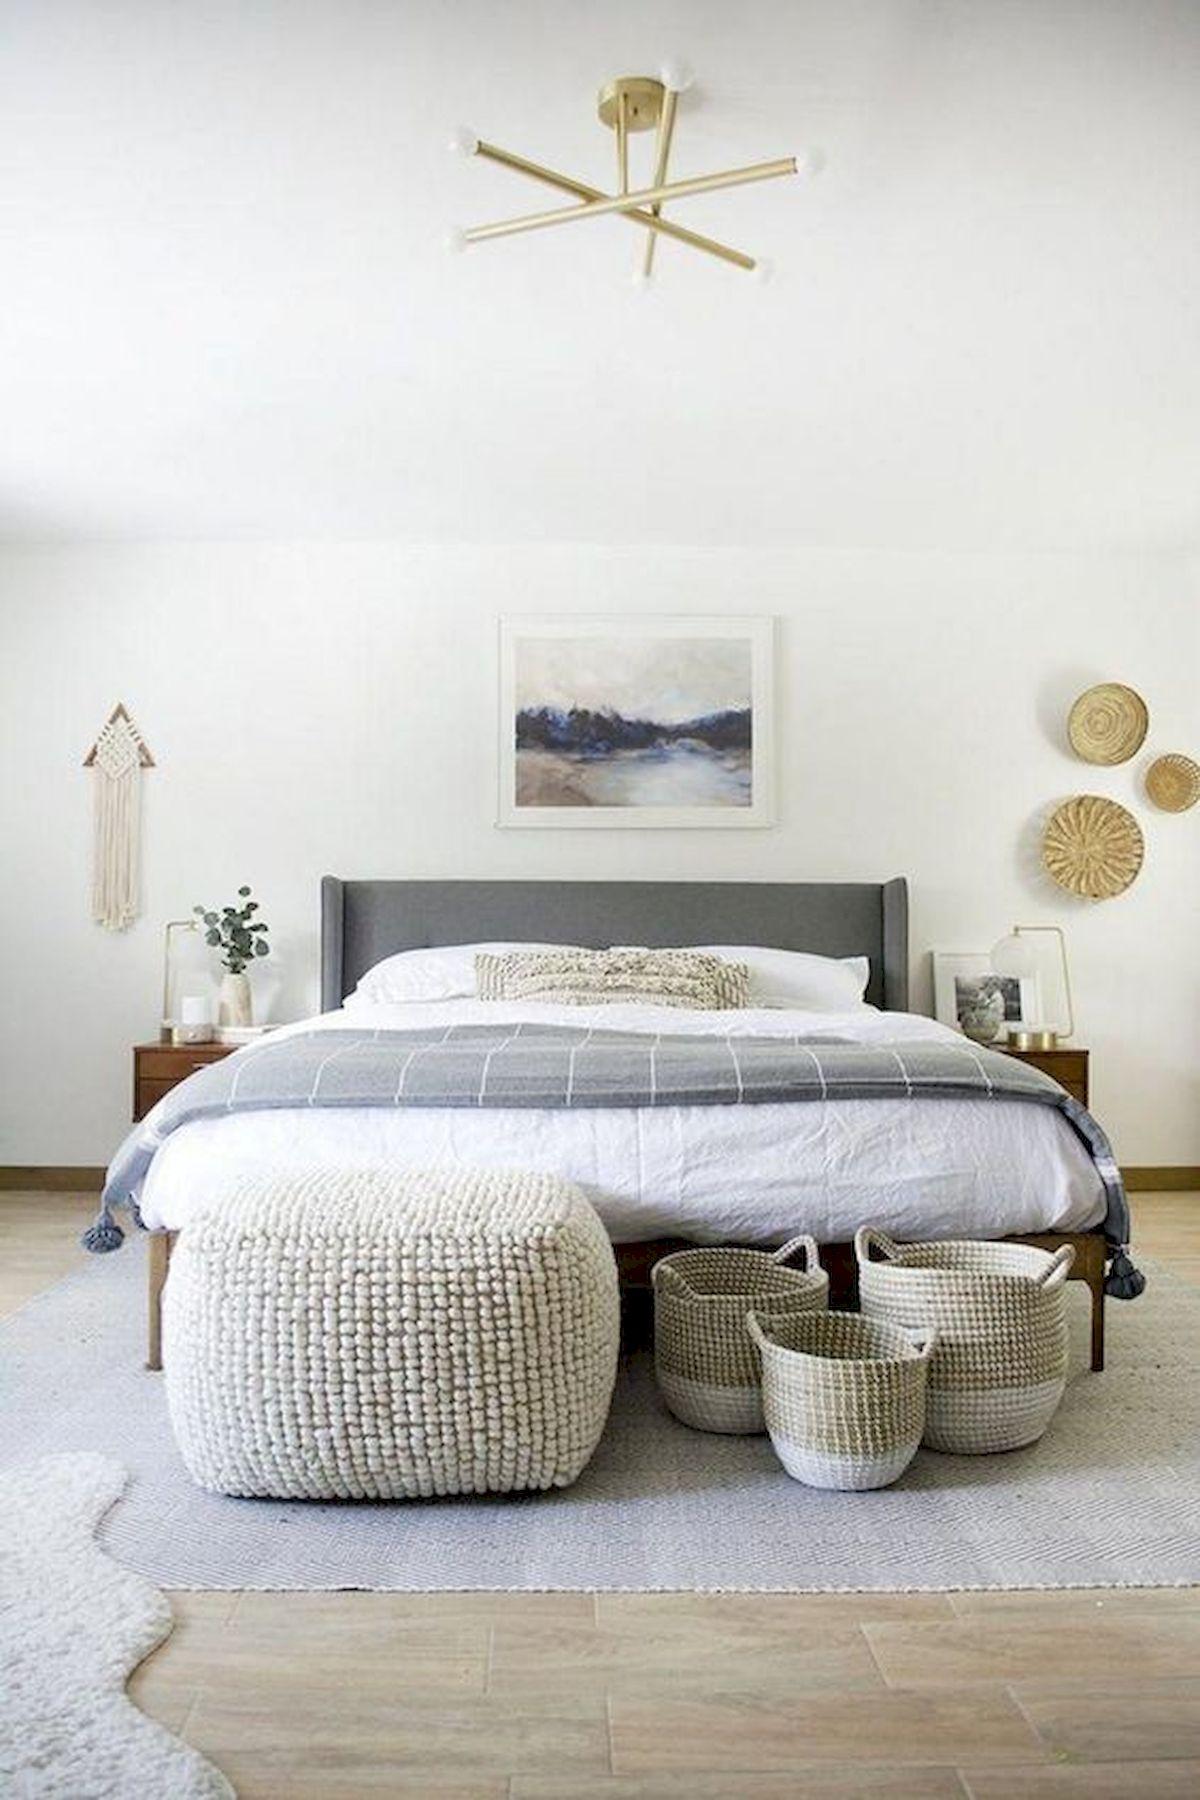 40 Fantastic DIY Decor Ideas For Farmhouse Boho Bedroom Design (18)